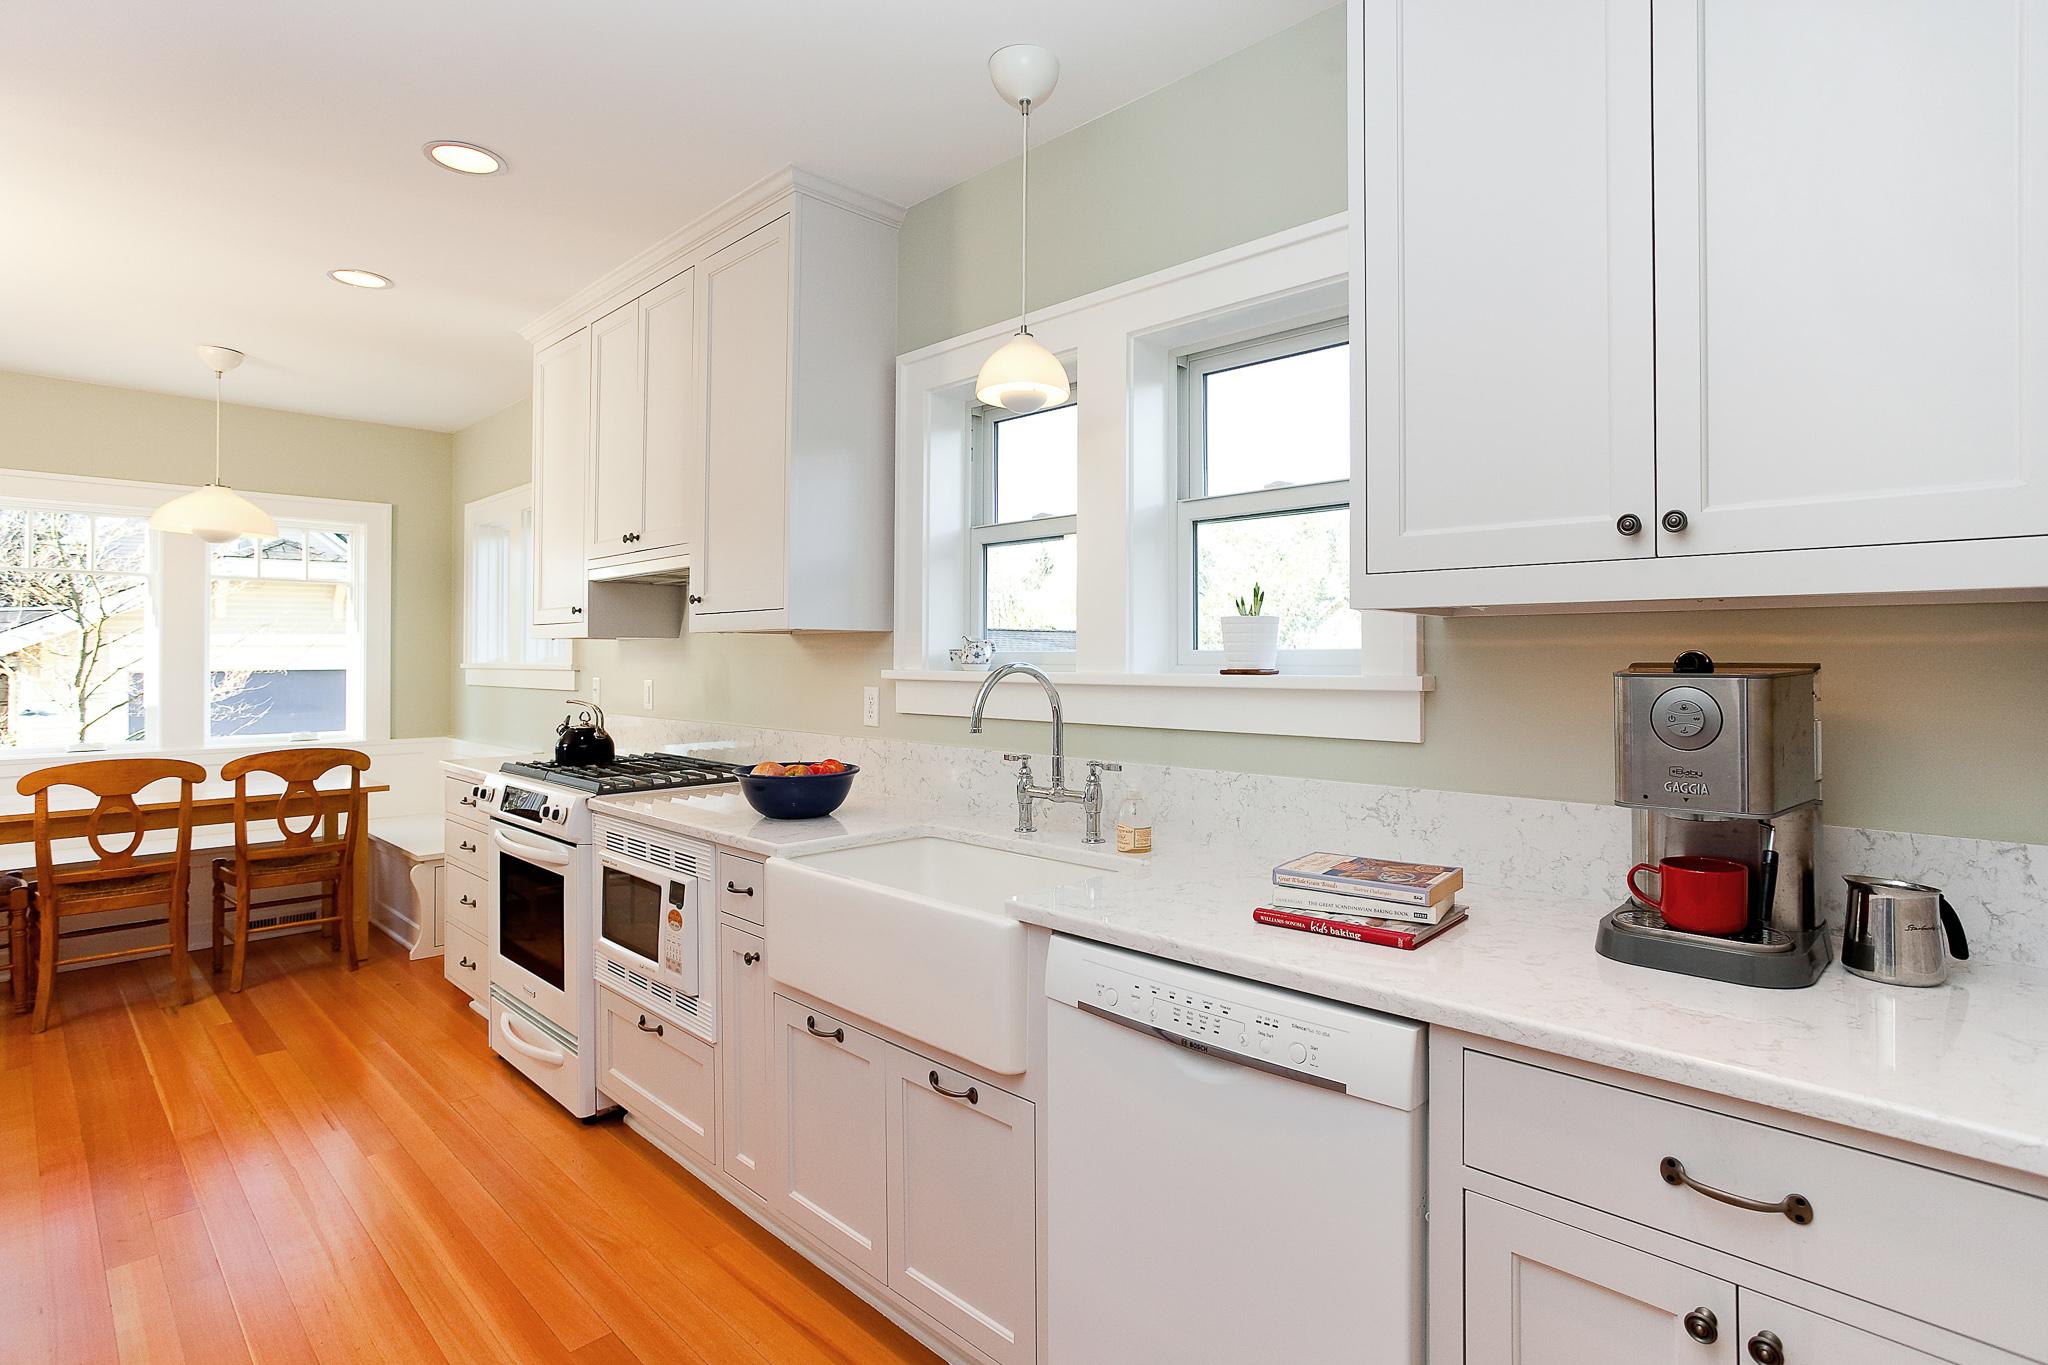 BALLARD Kitchen and Mudroom Remodel 2.jpg